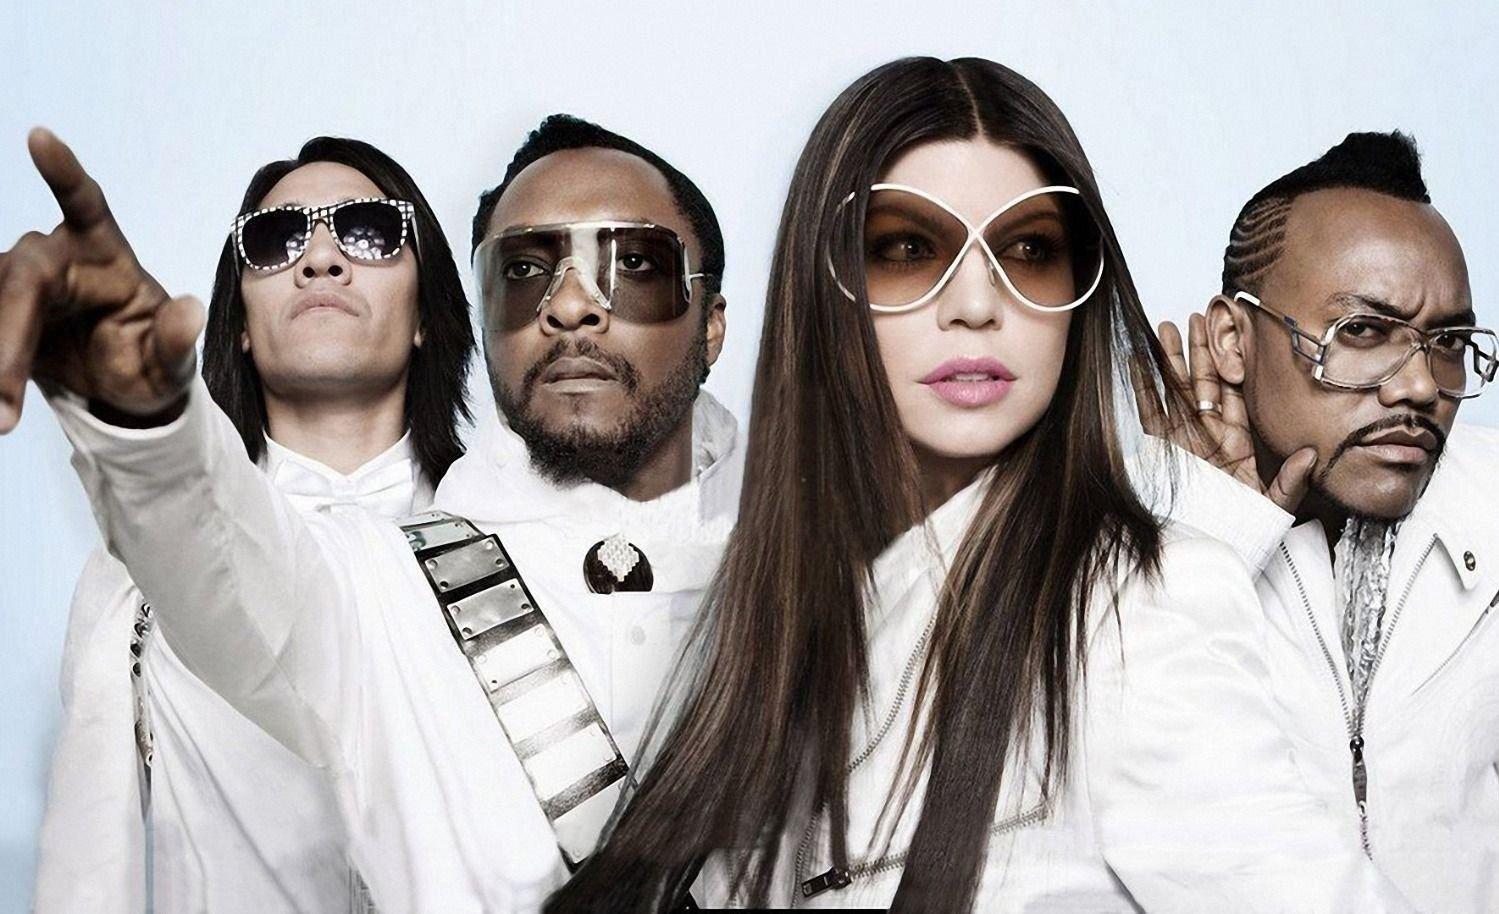 Elephunk de The Black Eyed Peas